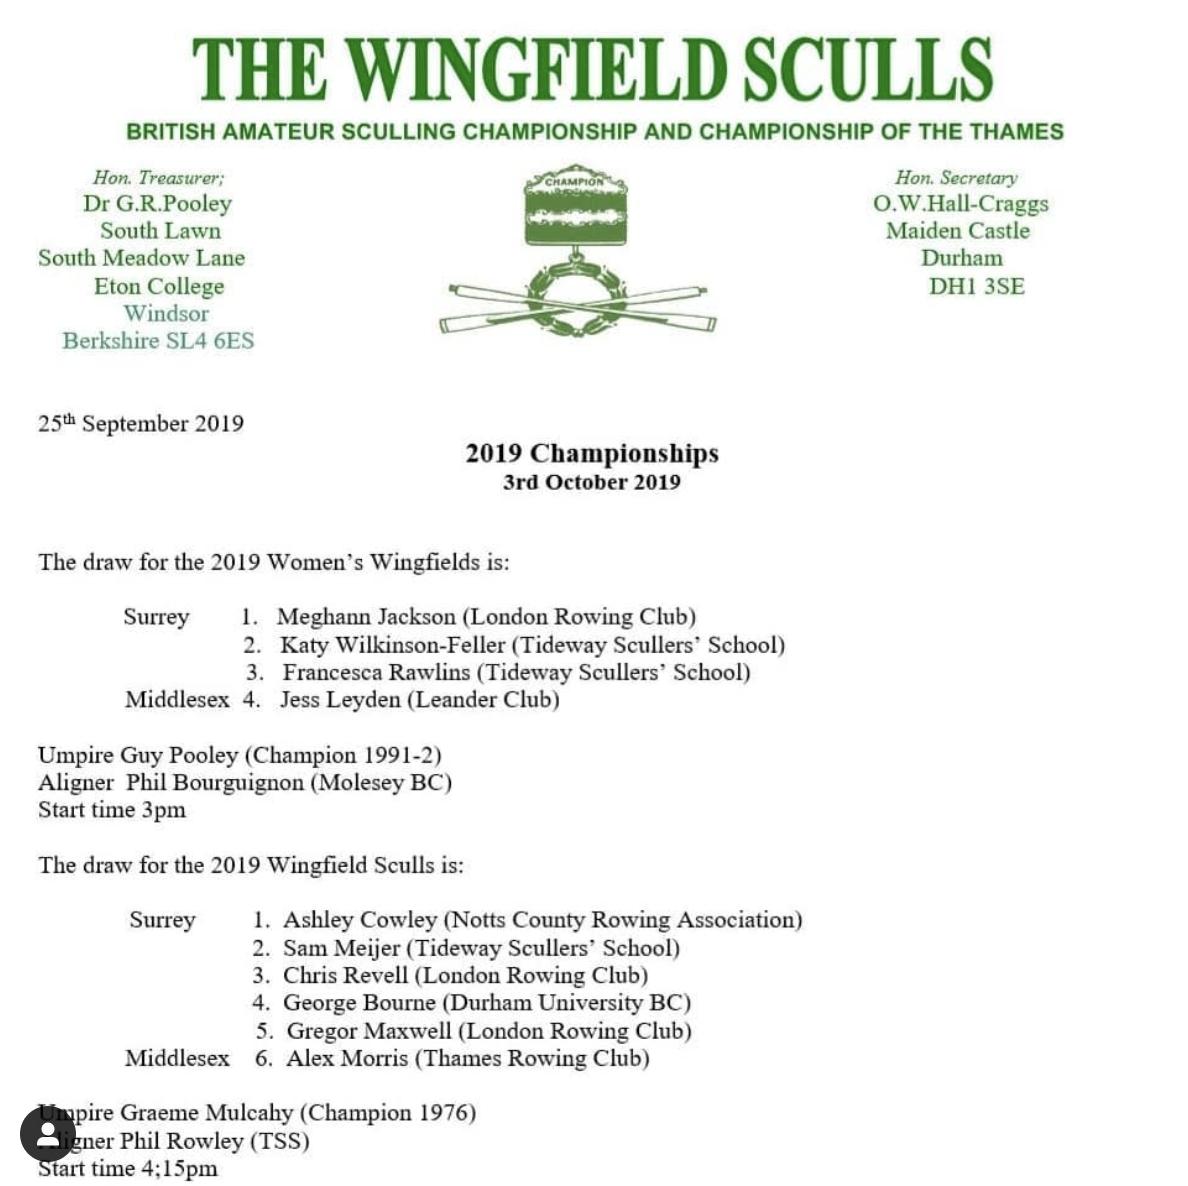 Wingfield_Sculls__order_2019.png